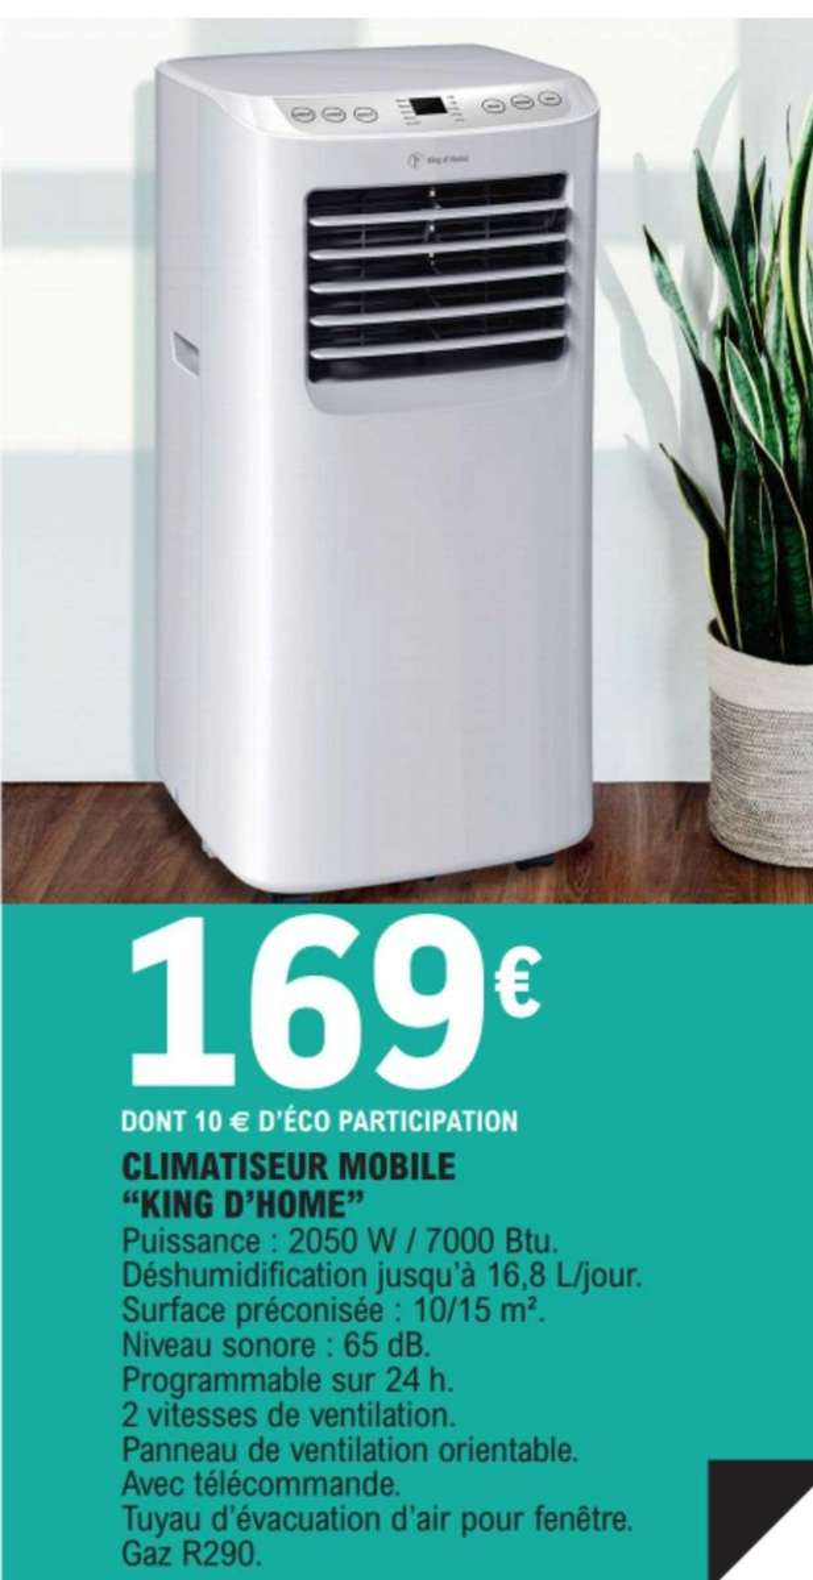 Climatiseur Mobile King D Home 2050w 7000 Btu Dealabs Com